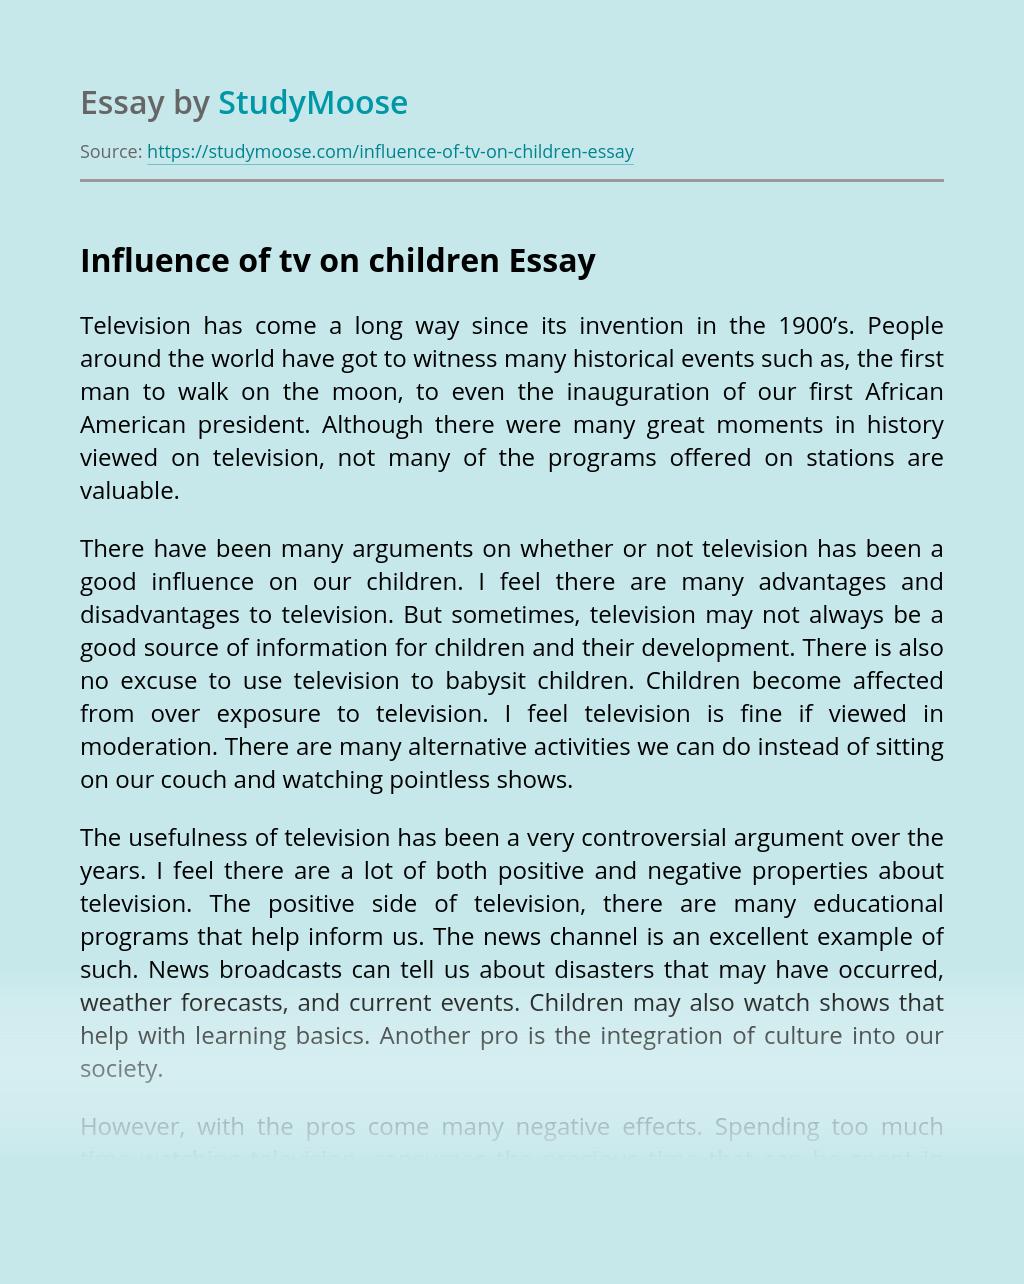 Influence of tv on children